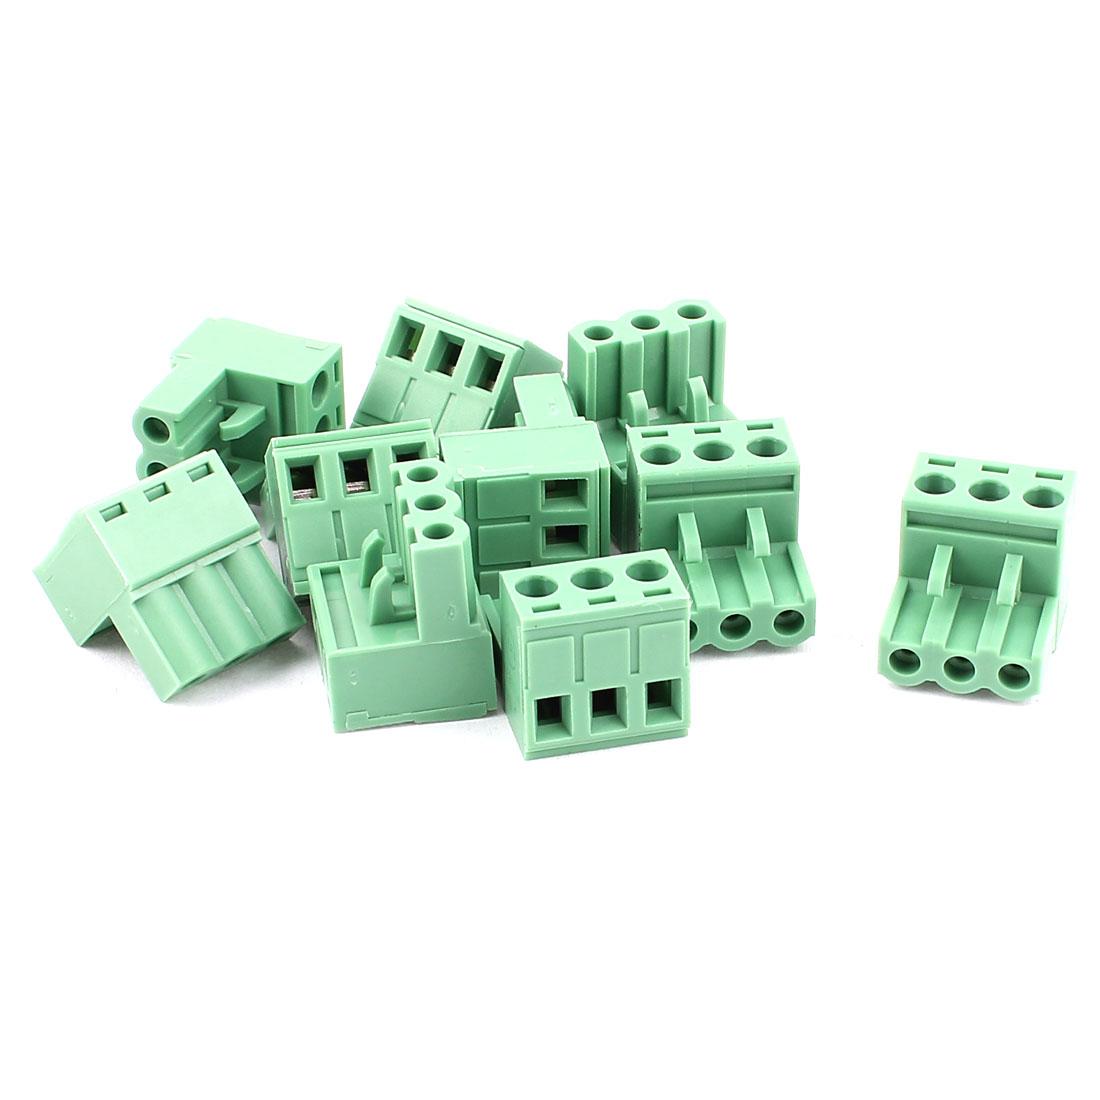 10Pcs KF2EDG 5.08mm Pitch 3 Terminals Pluggable Teminal Blocks Connector Socket